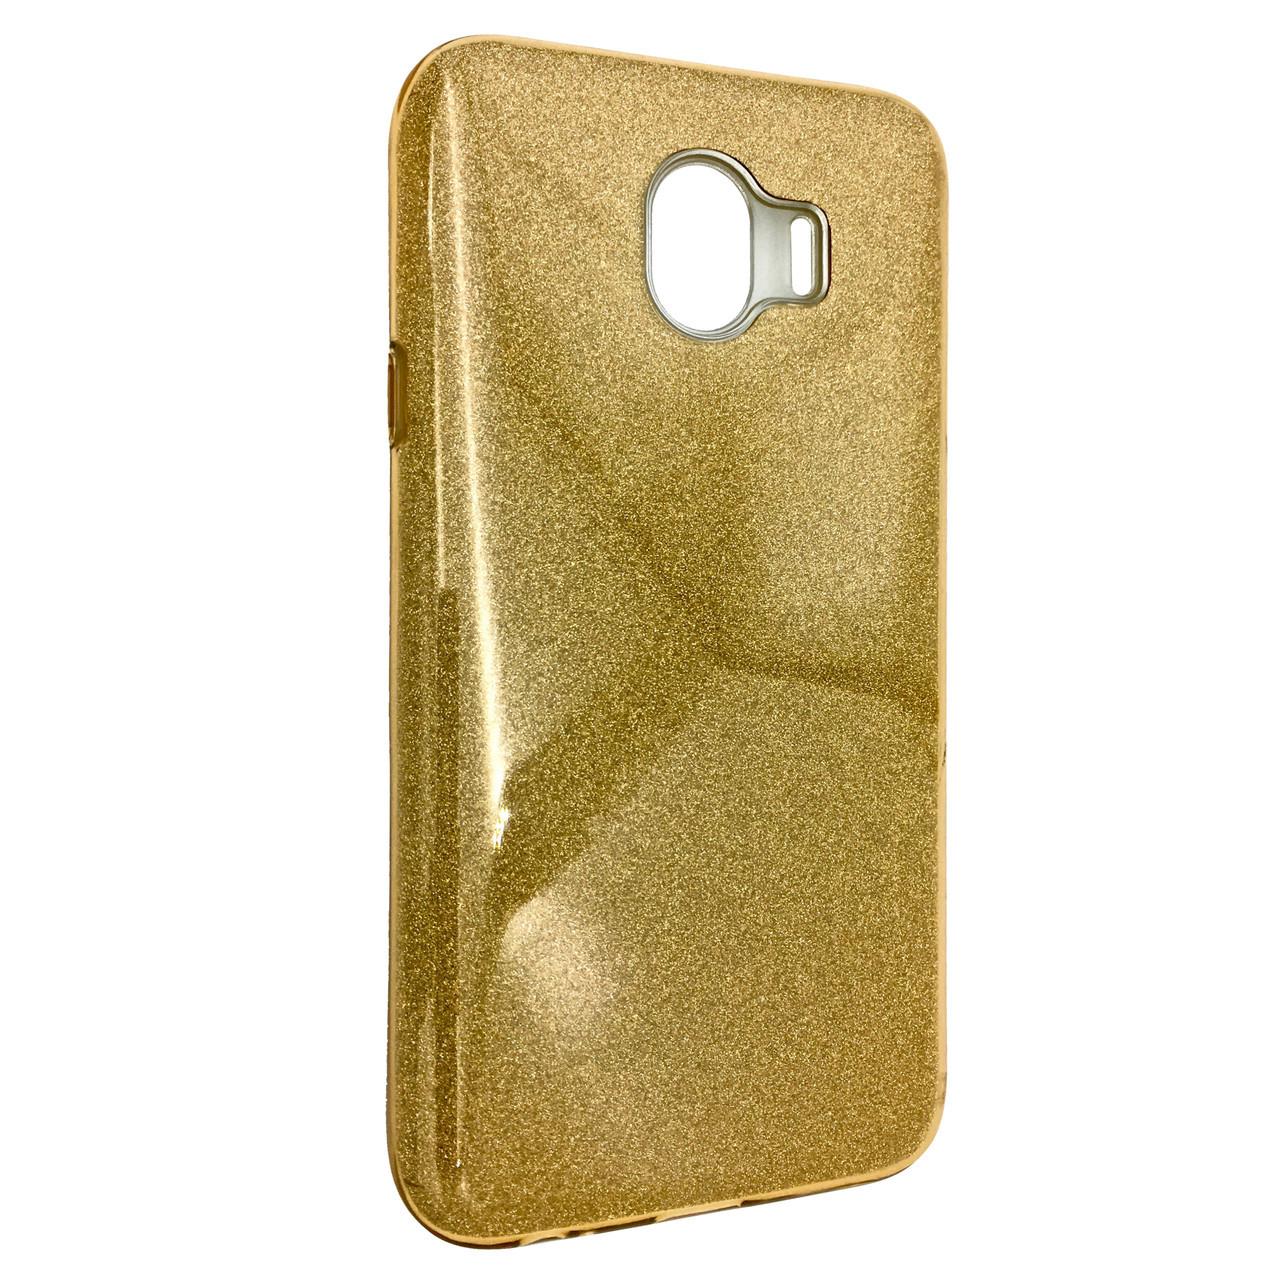 Чехол Silicone Glitter Heaven Rain Samsung J400 (2018) (gold)